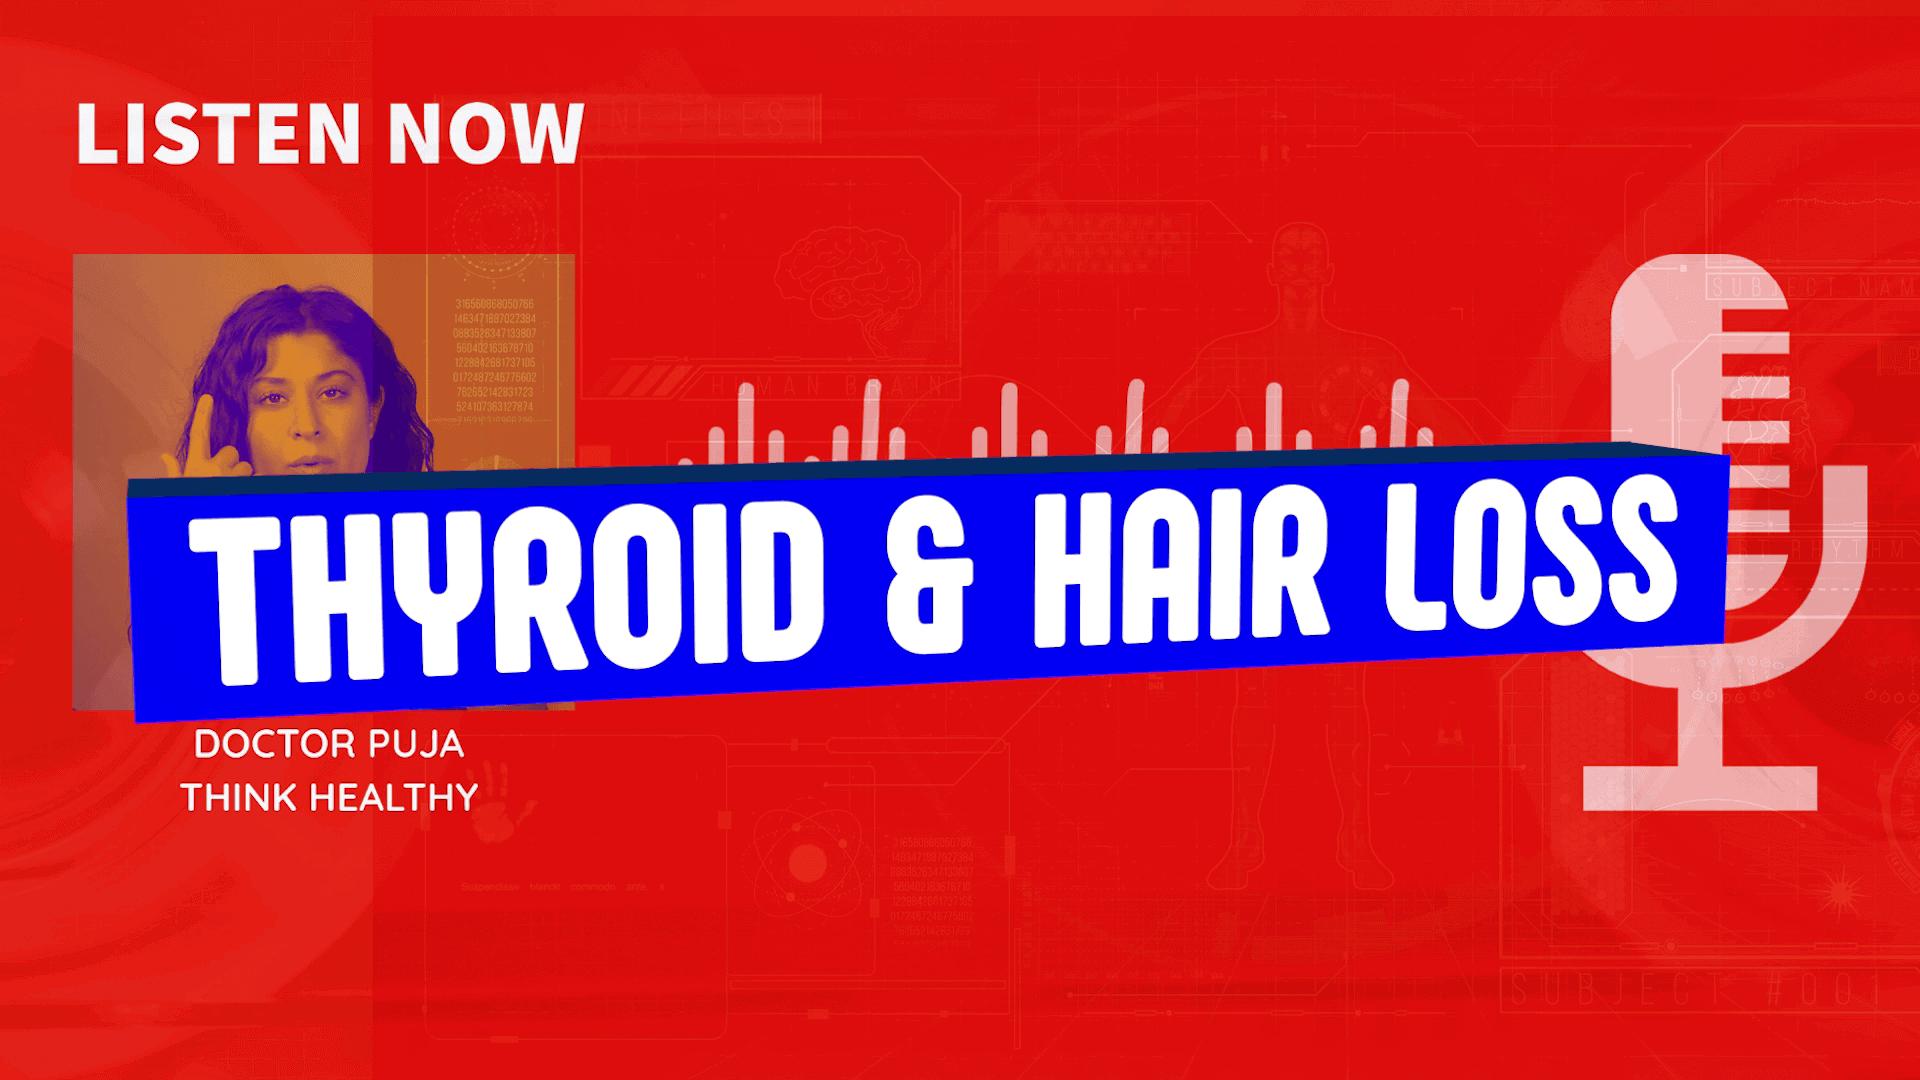 Thyroid and hair loss